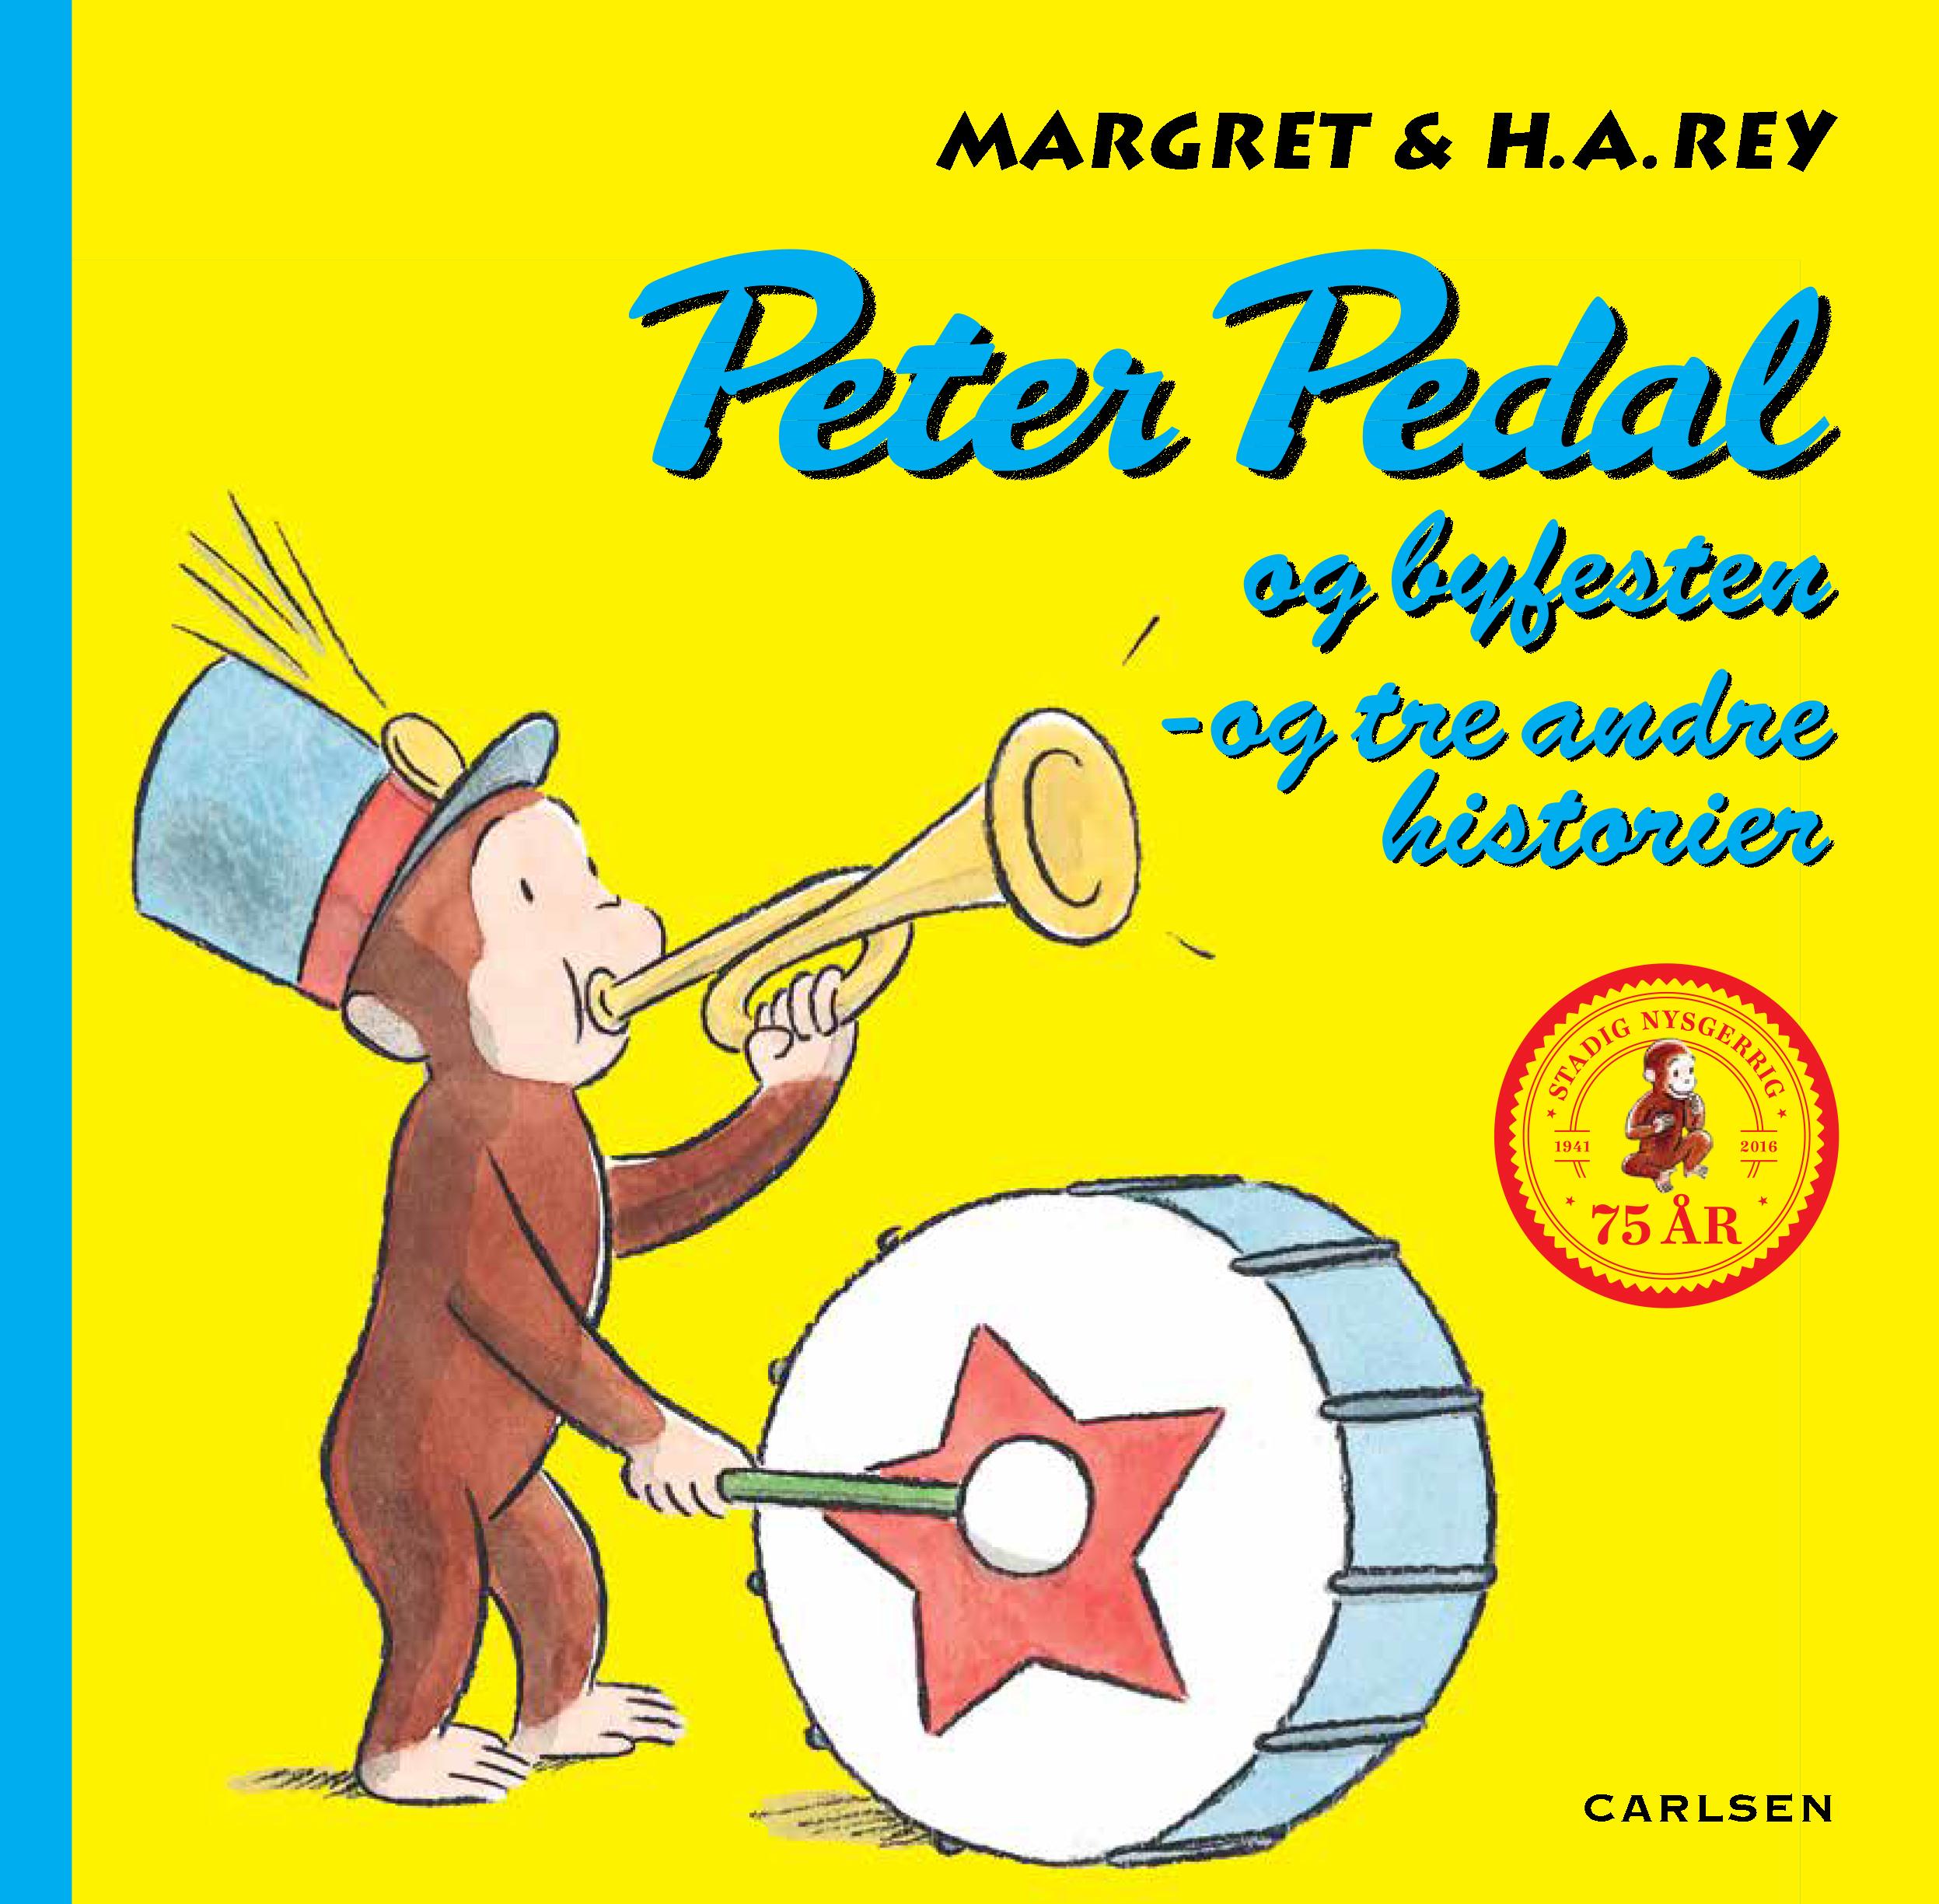 Carlsen – Carlsen peter pedal og byfesten +3 historier, +10 stk. på lager fra pixizoo